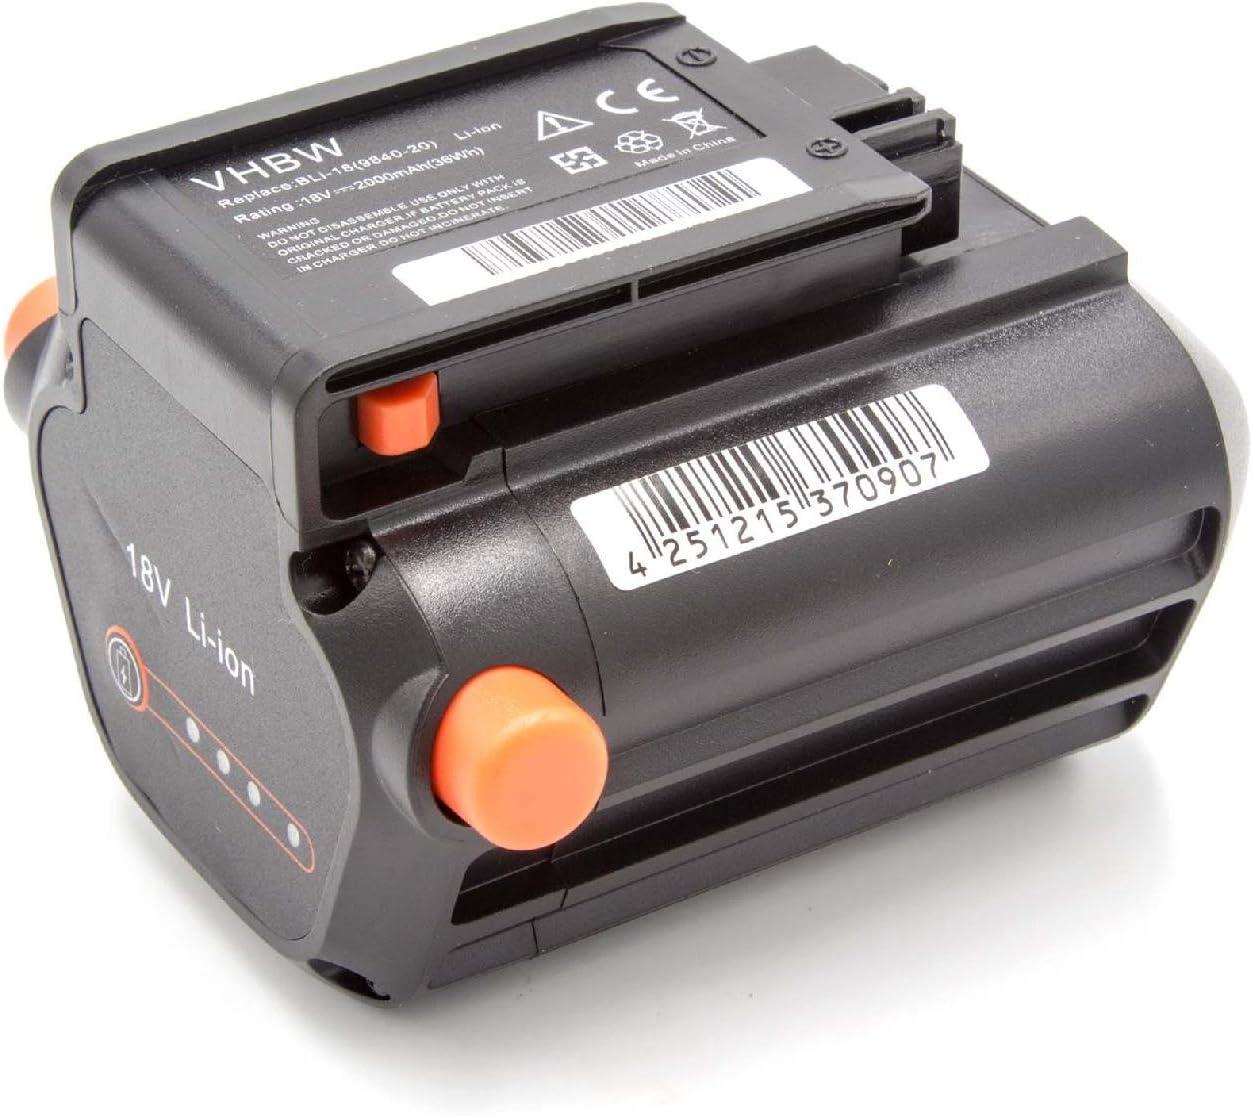 ComfortCut Li-18//50 /& Li-18//60 wie BLi-18 vhbw Akku passend f/ür Gardena Akku-Heckenschere EasyCut Li-18//50 Li-Ion, 1500mAh, 18V 9840-20 9839-20 -